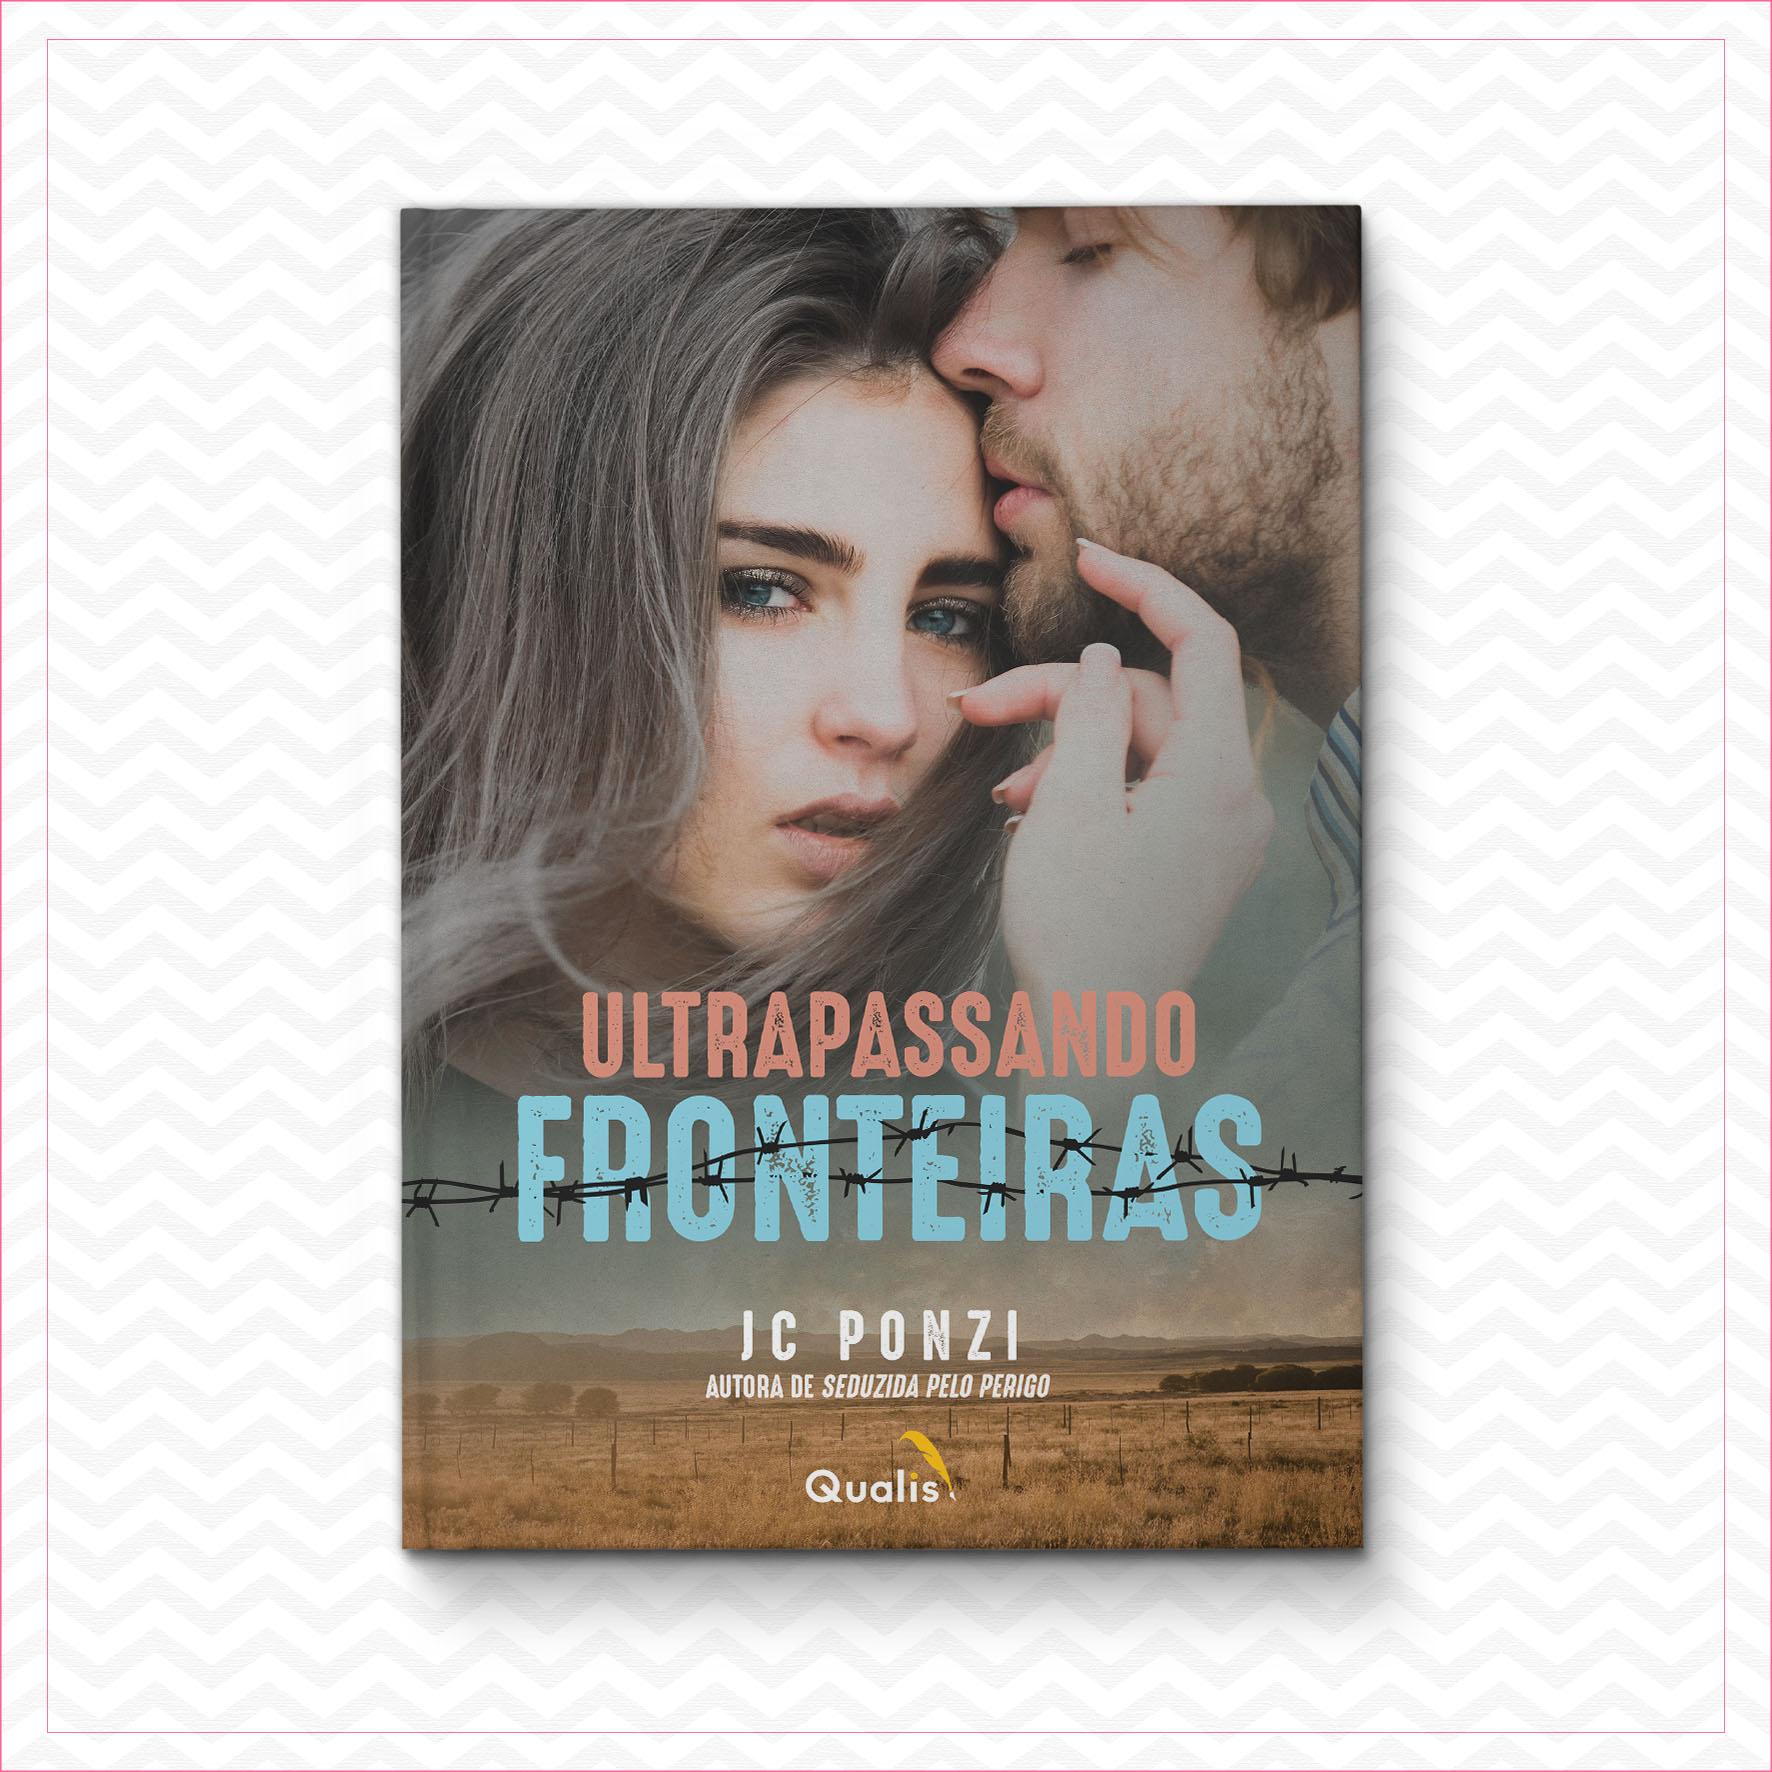 Ultrapassando fronteiras – JC Ponzi